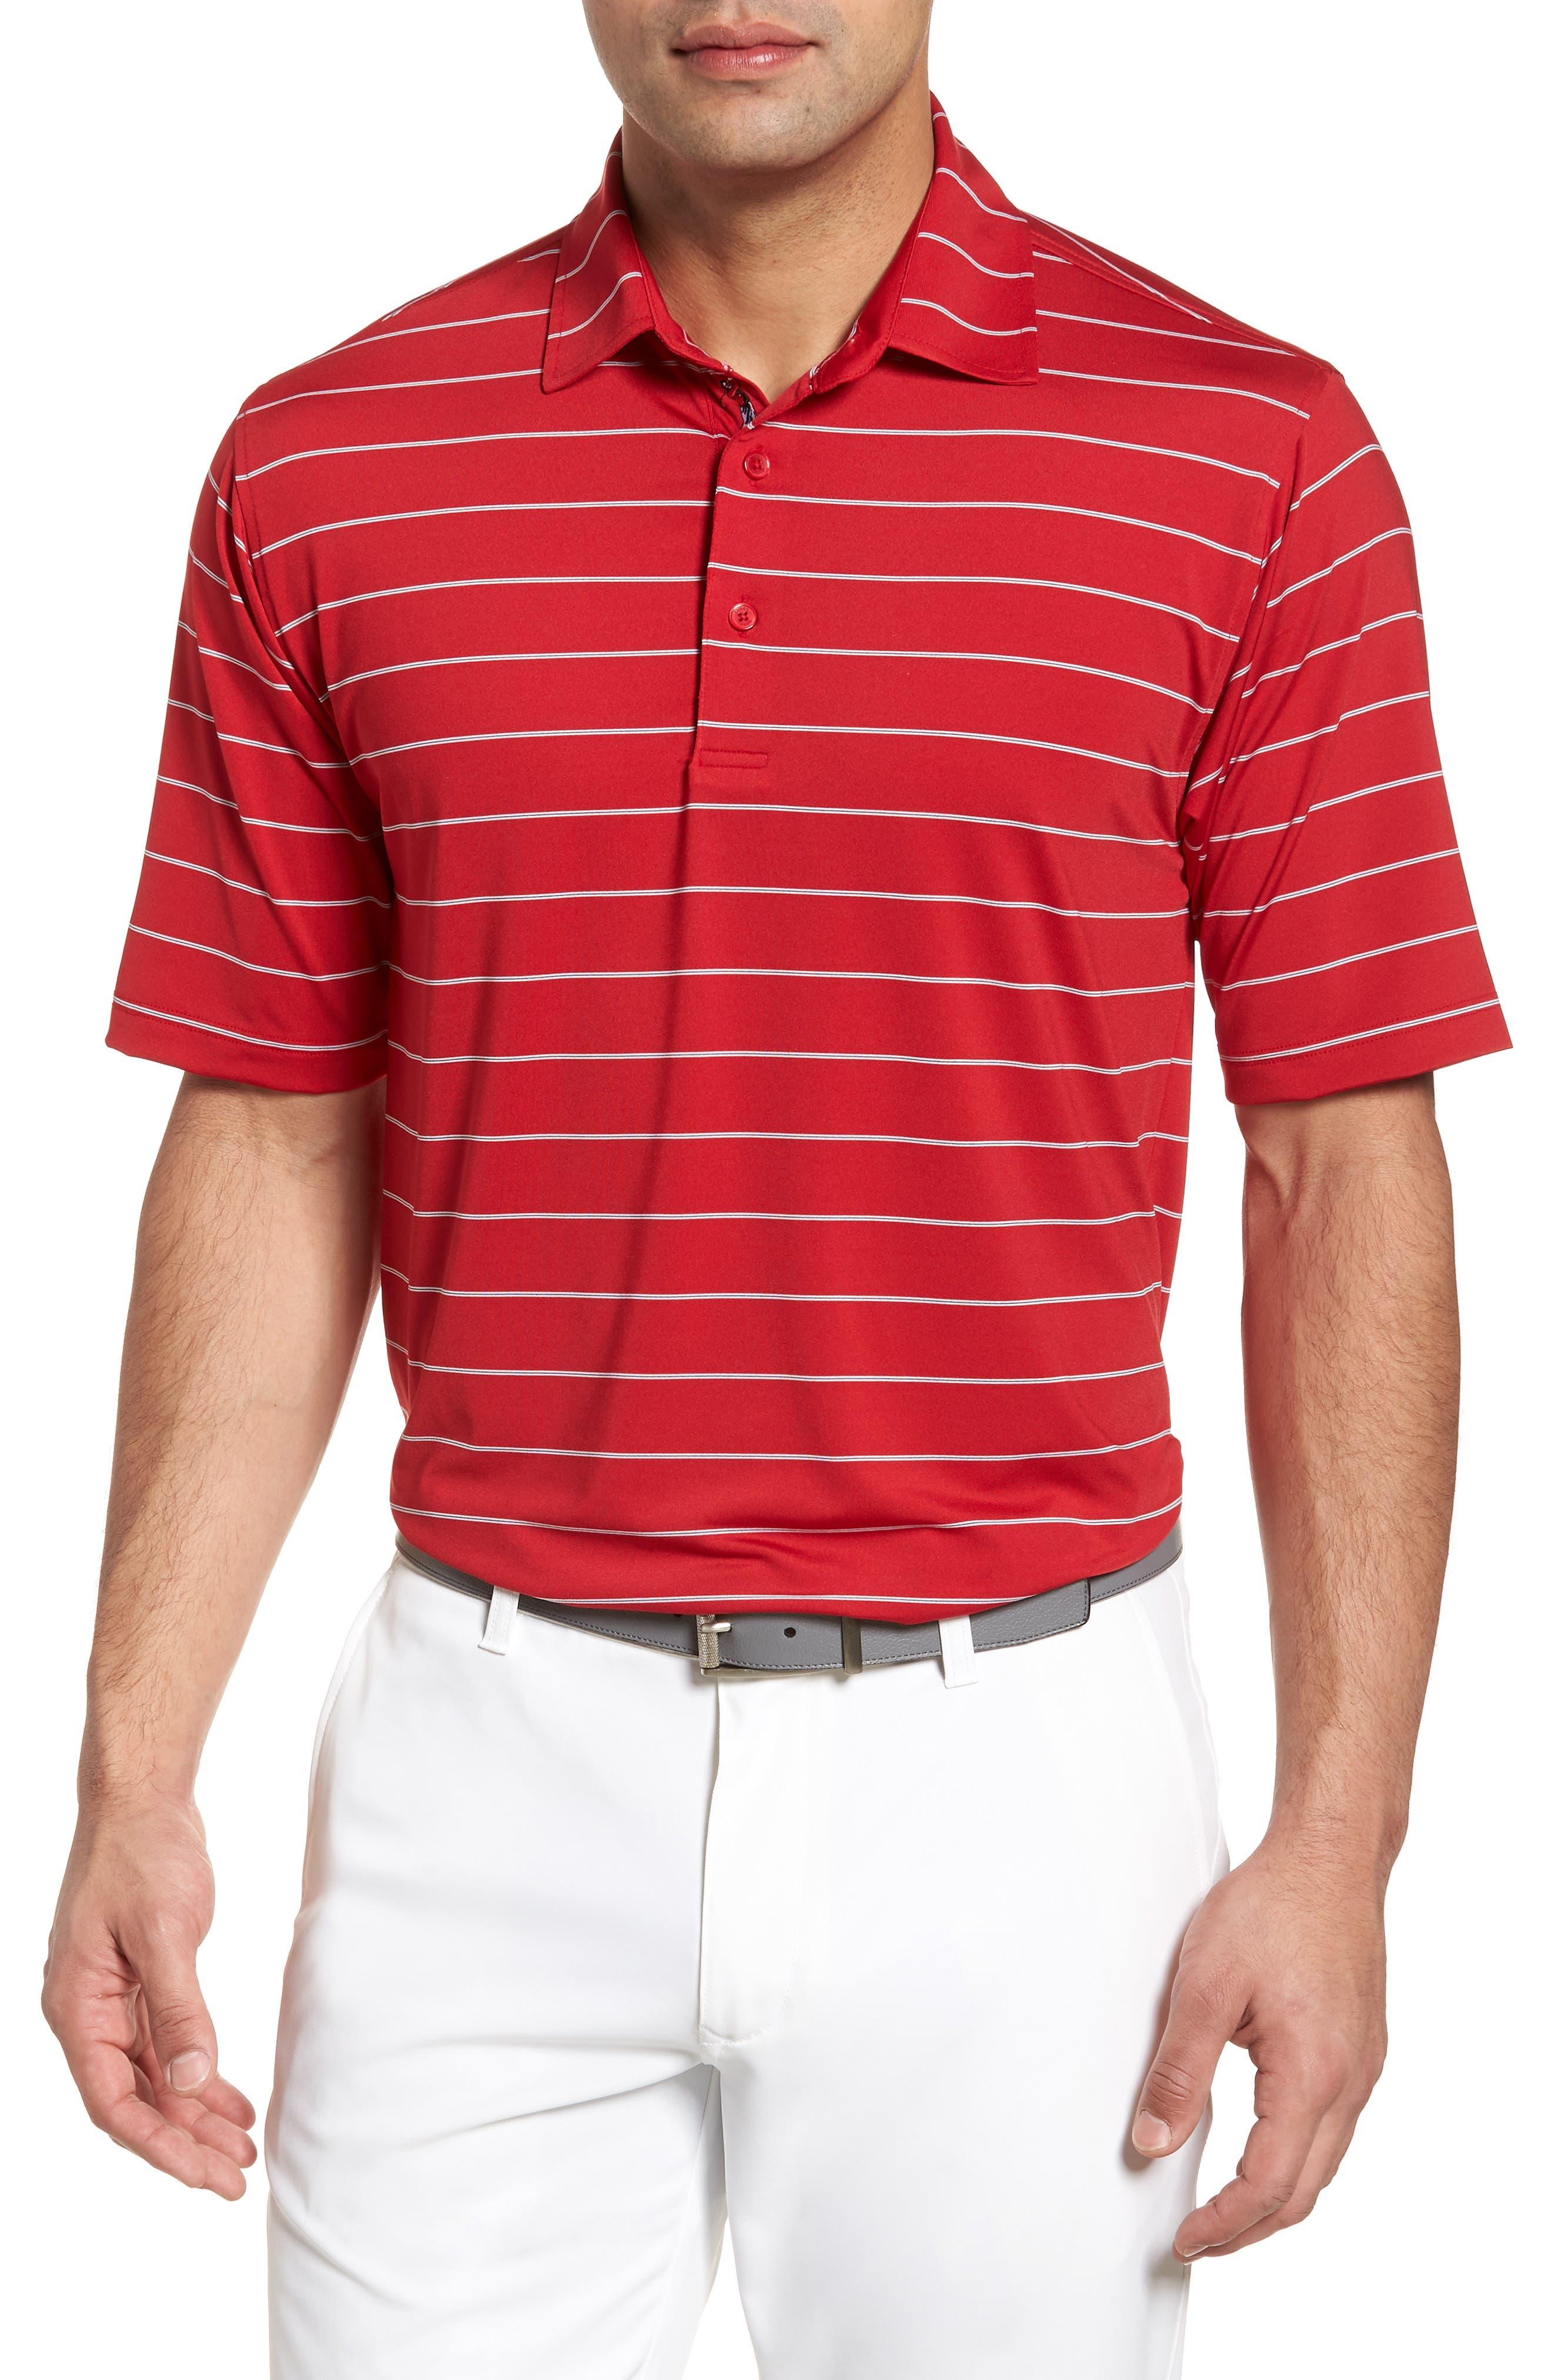 BOBBY JONES Xh2O Momentum Stripe Jersey Polo in Cambridge Red